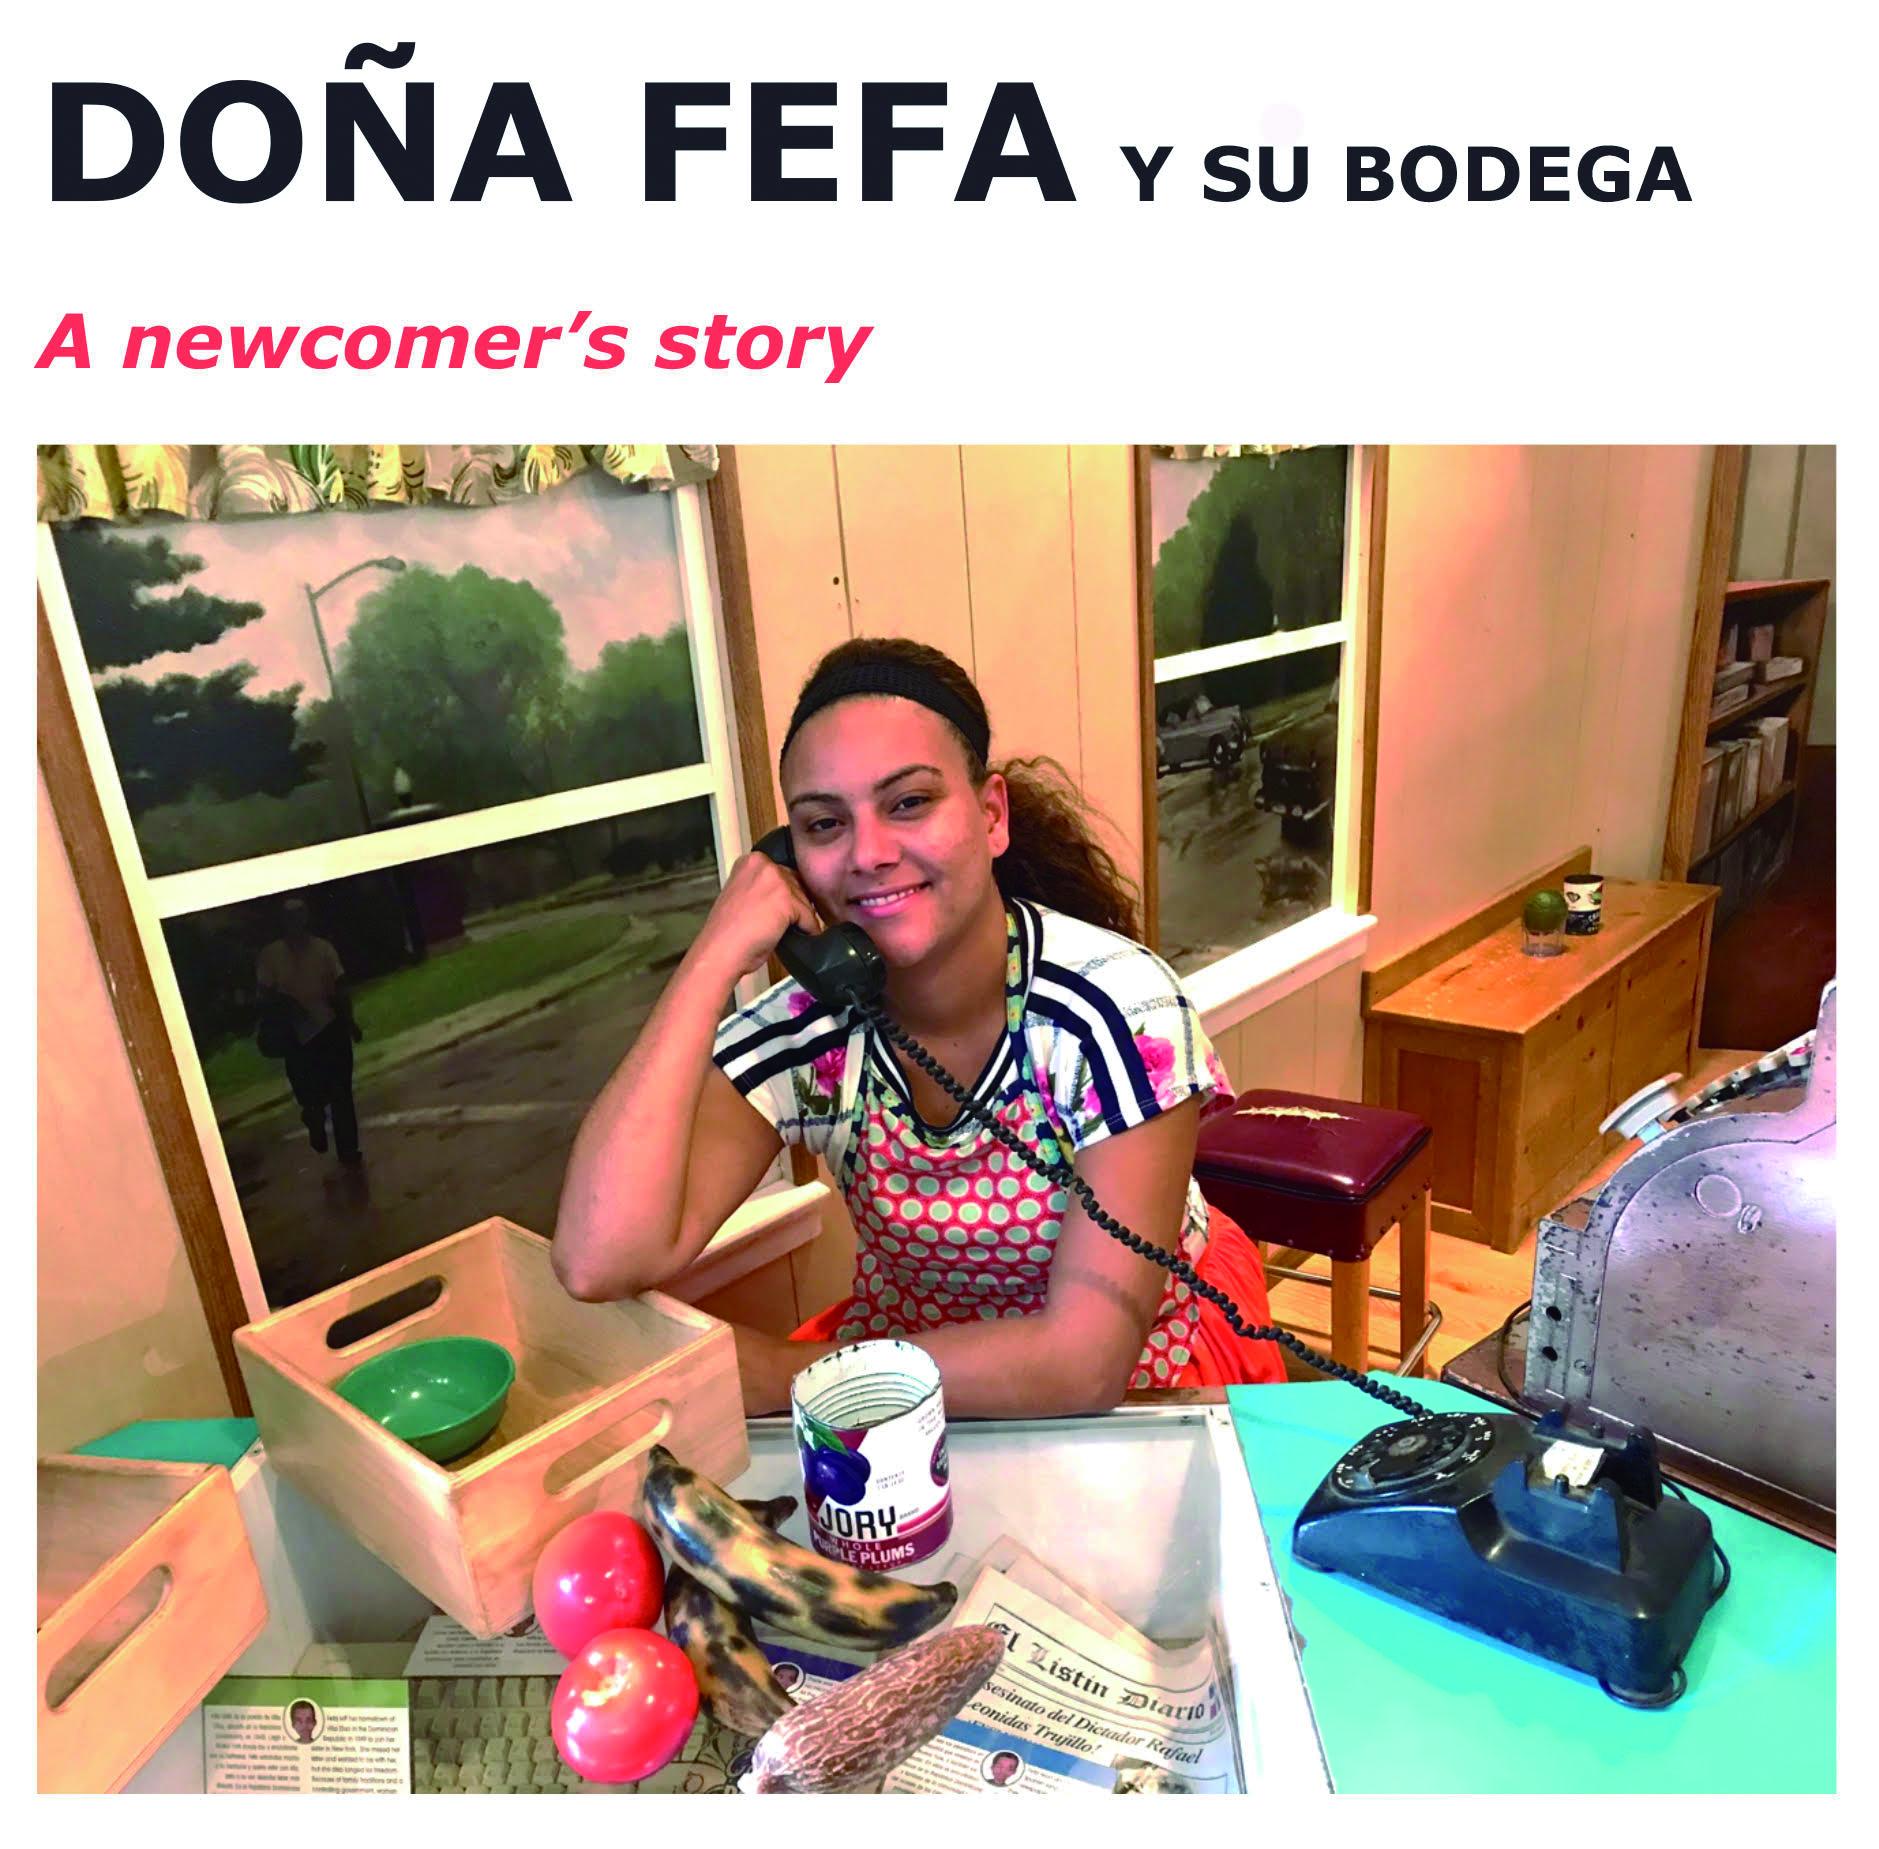 FEFA Y SU BODEGA: A NEWCOMER'S STORYARTIST: Teatro Latino @ Rhode Island Latino Arts